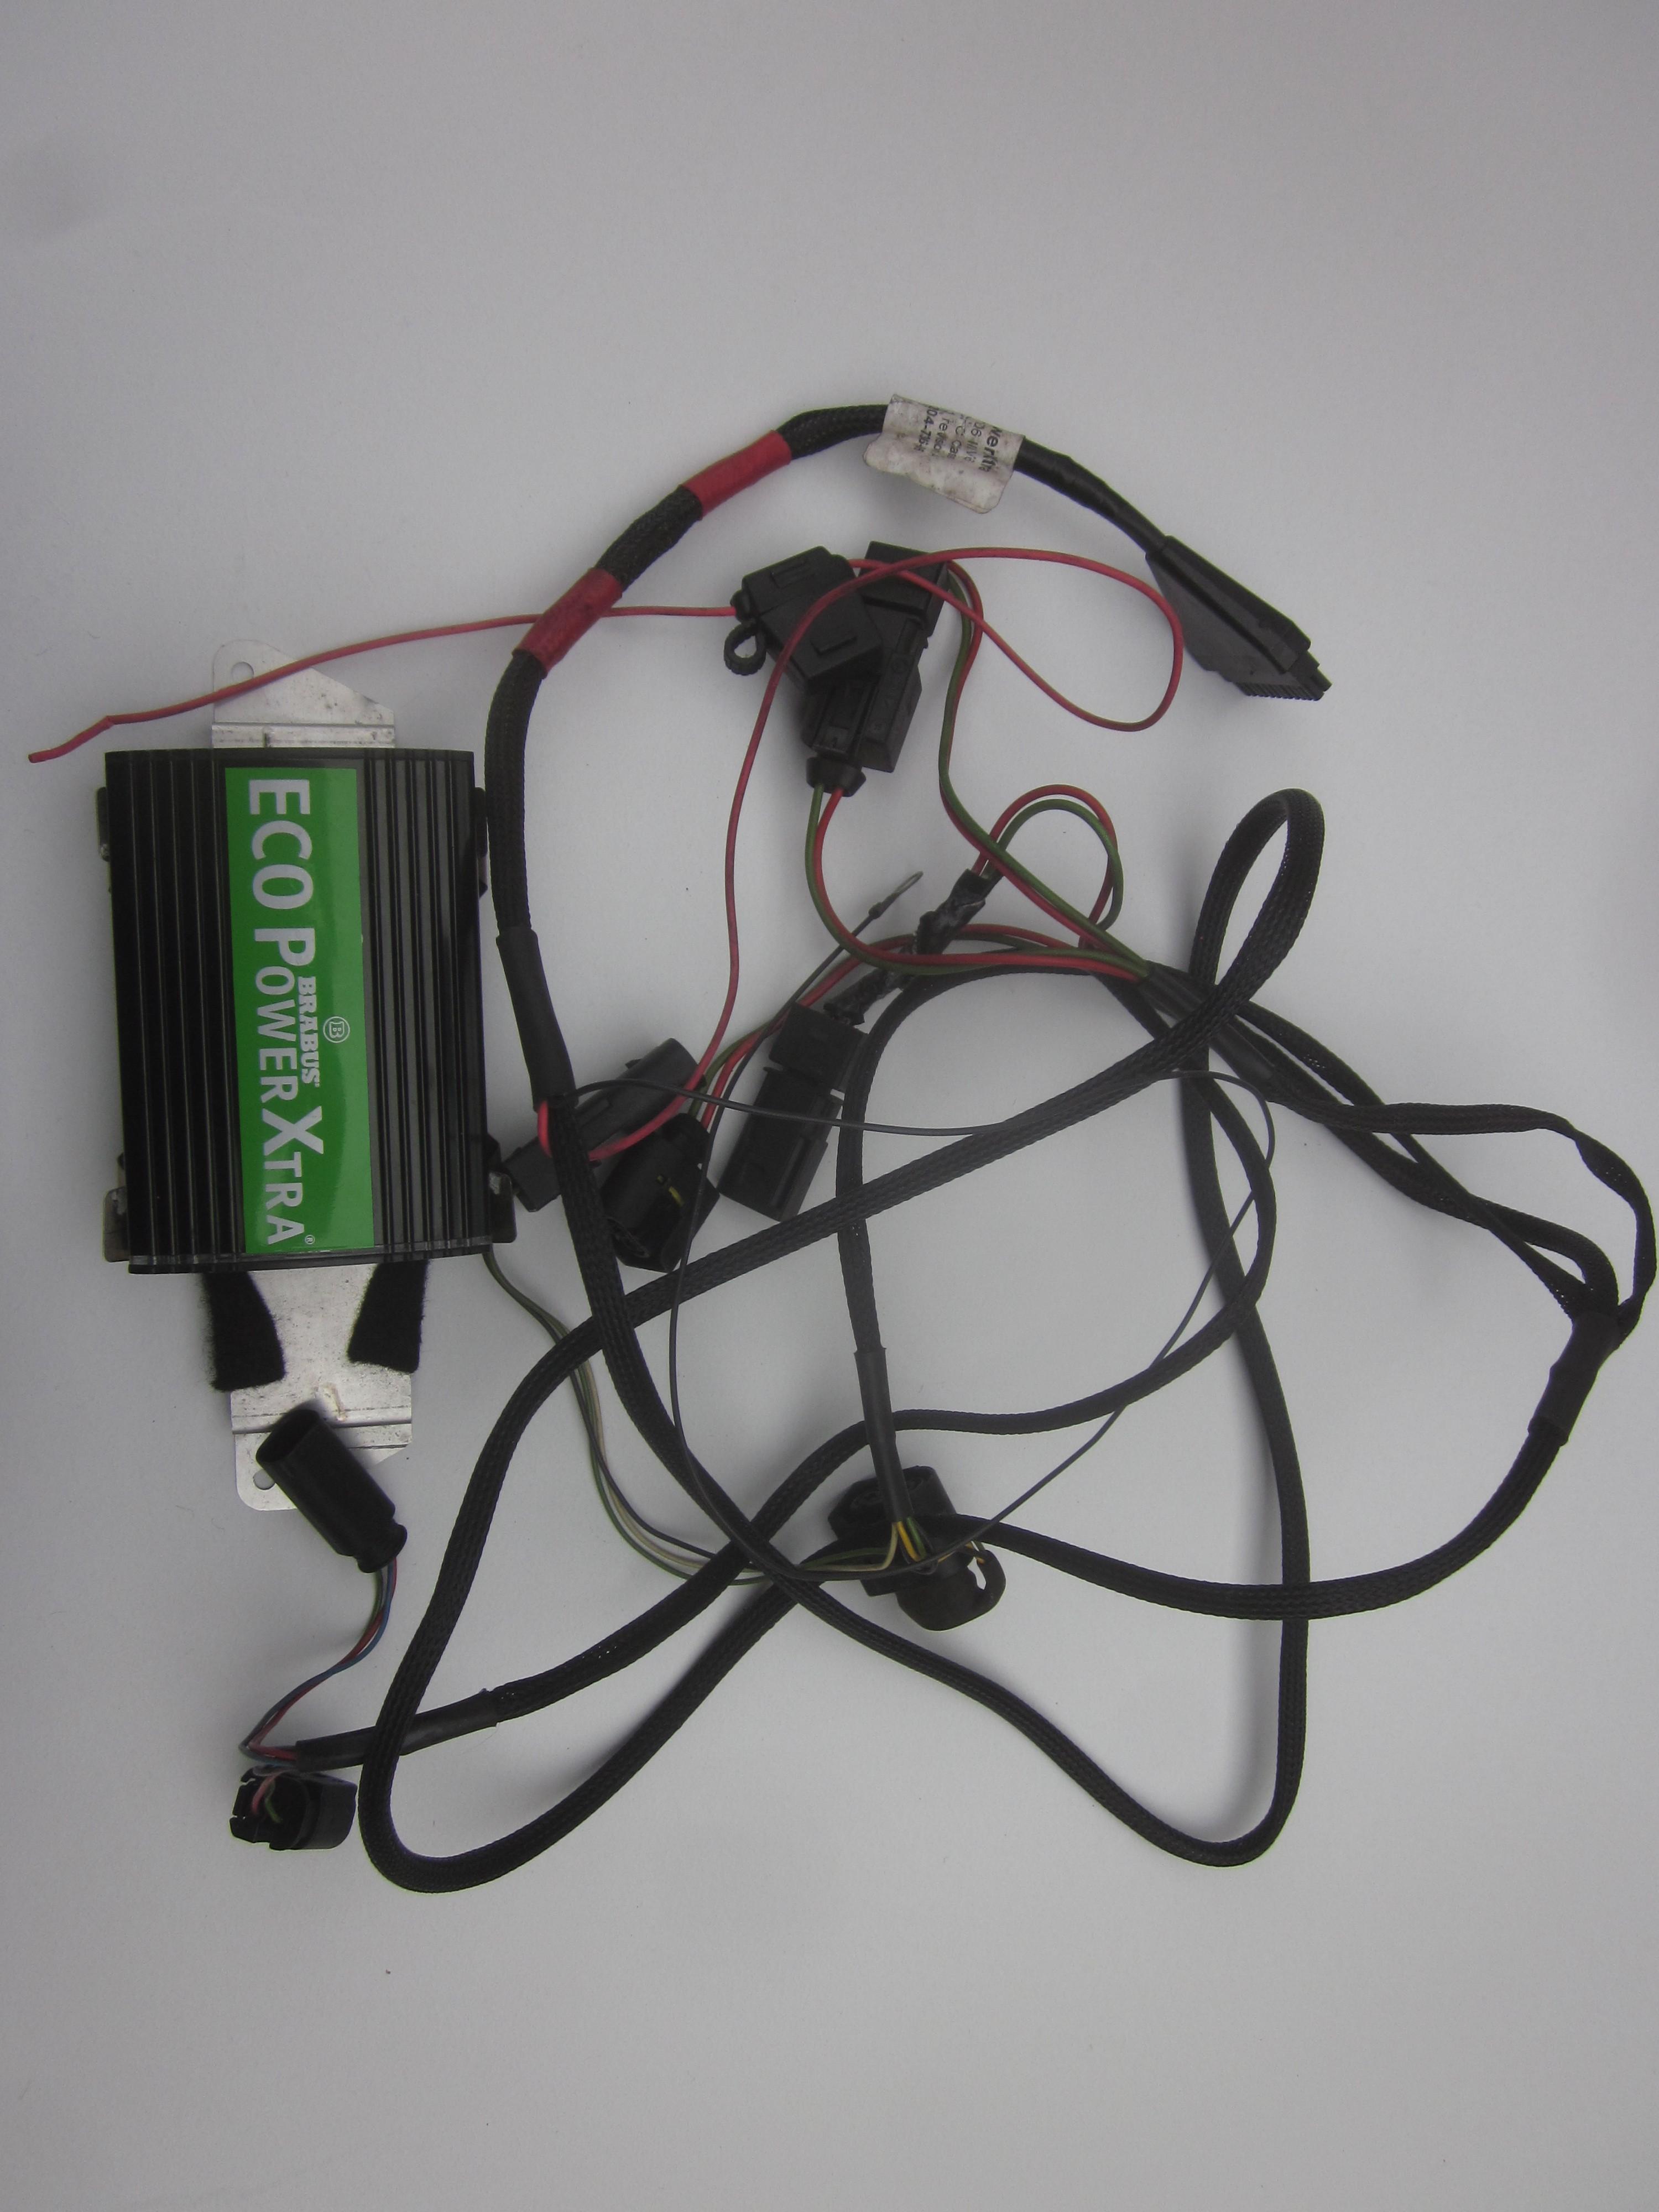 brabus d6 iii eco power xtra tuning kit **bargain**  fitting instructions here www zen104526 zen co uk brabus d6 fitting pdf